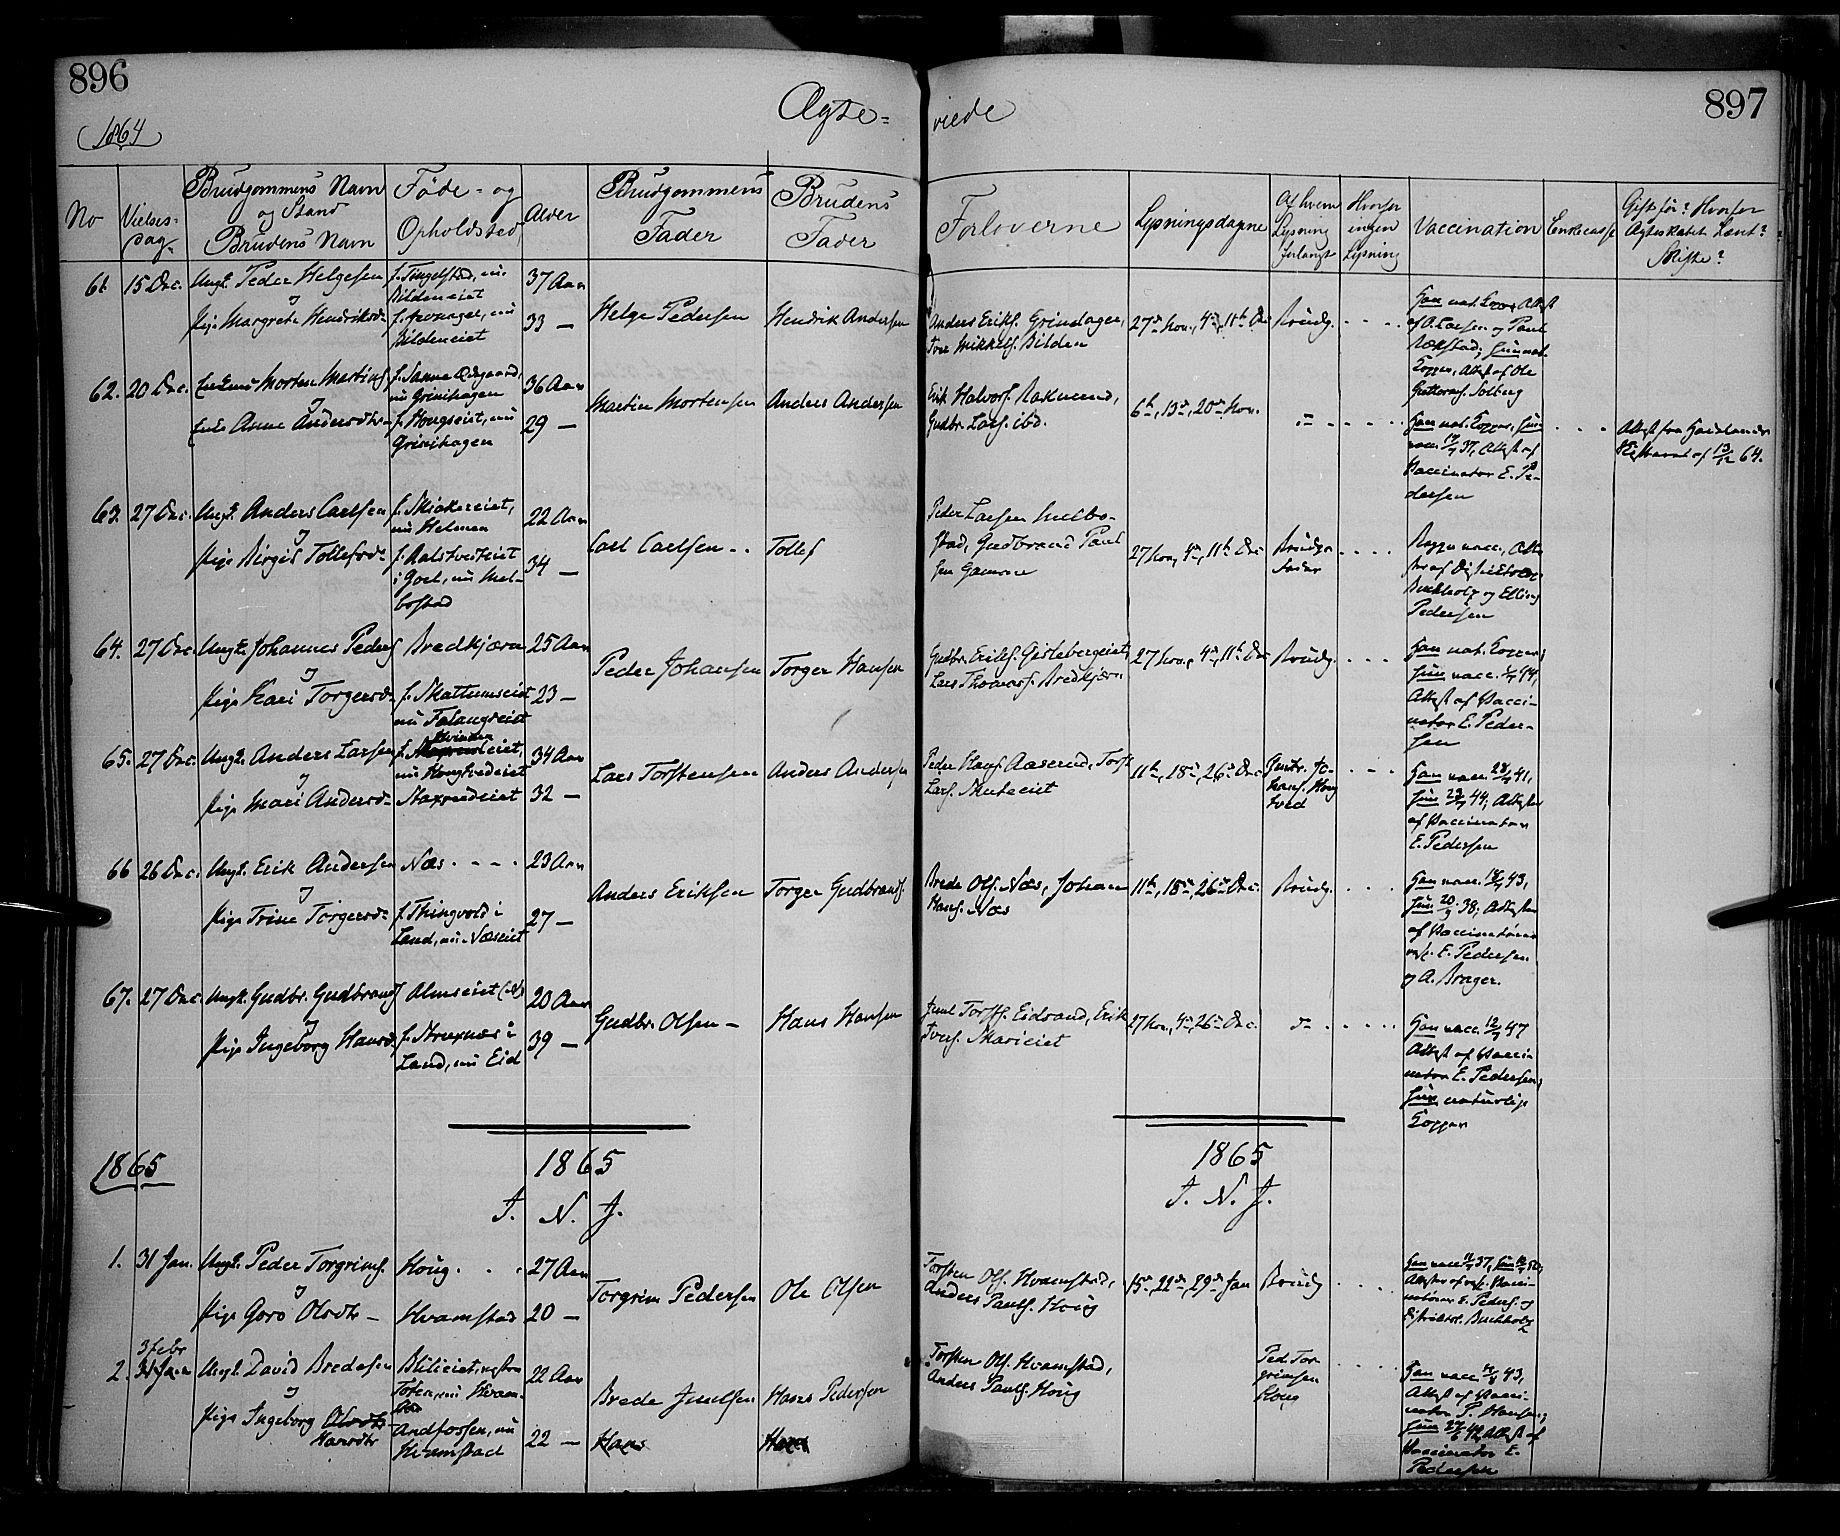 SAH, Gran prestekontor, Ministerialbok nr. 12, 1856-1874, s. 896-897